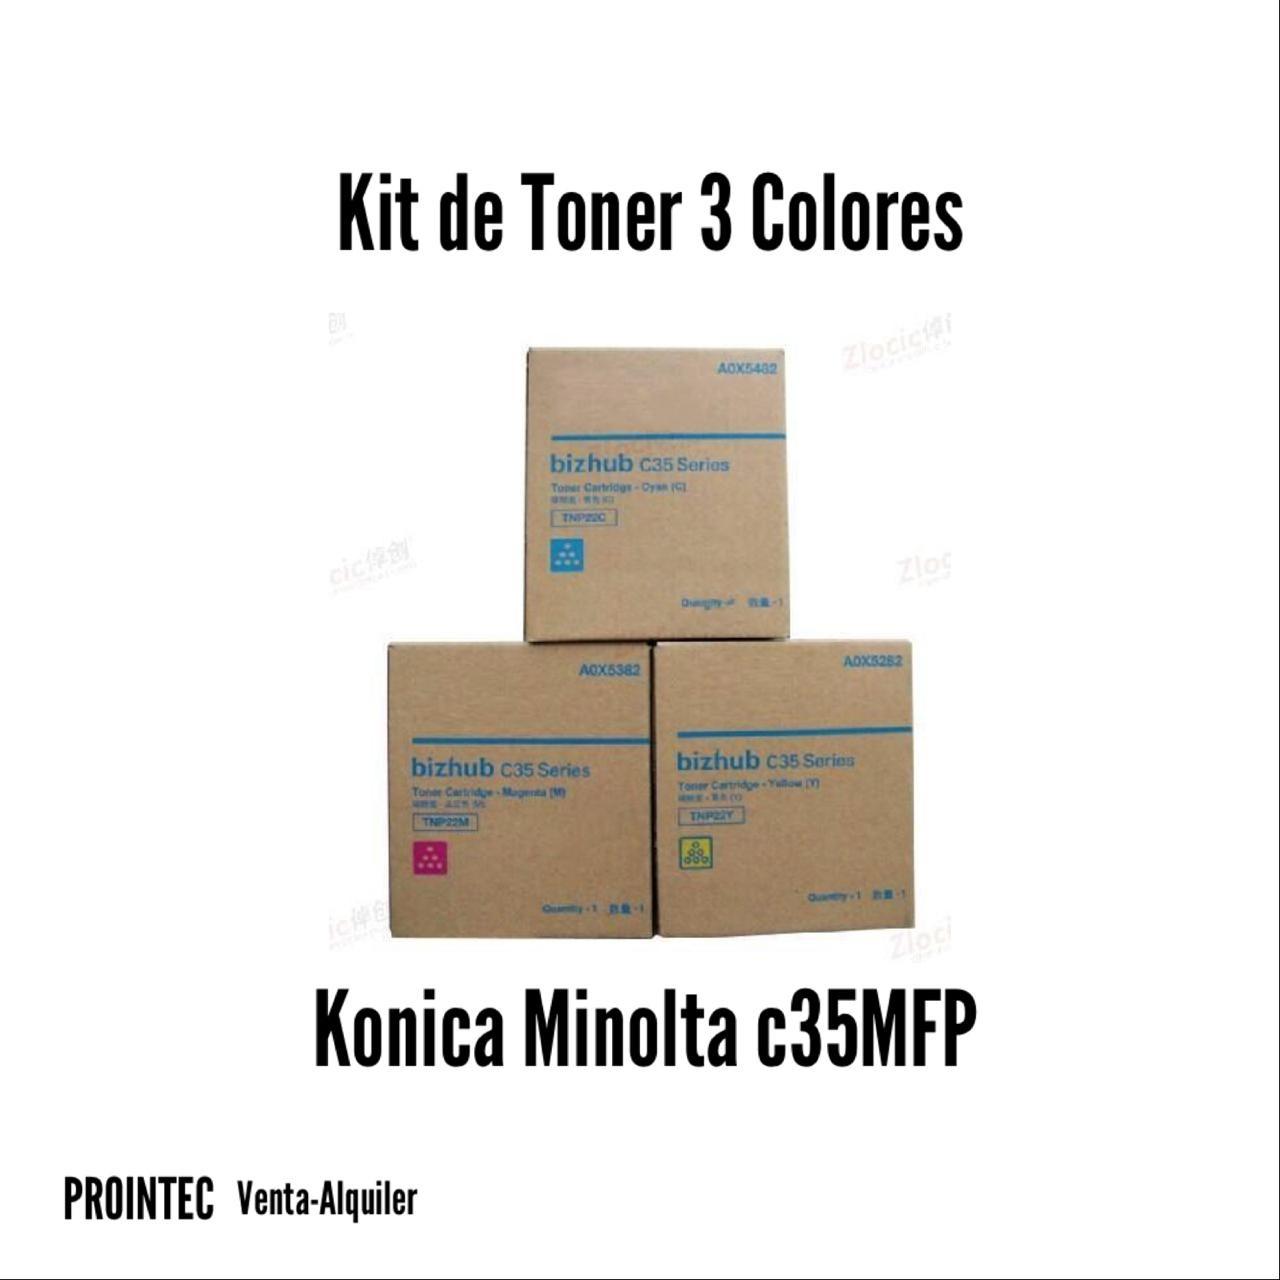 Kit de Tóner Minolta C35 MFP   C, M, Y